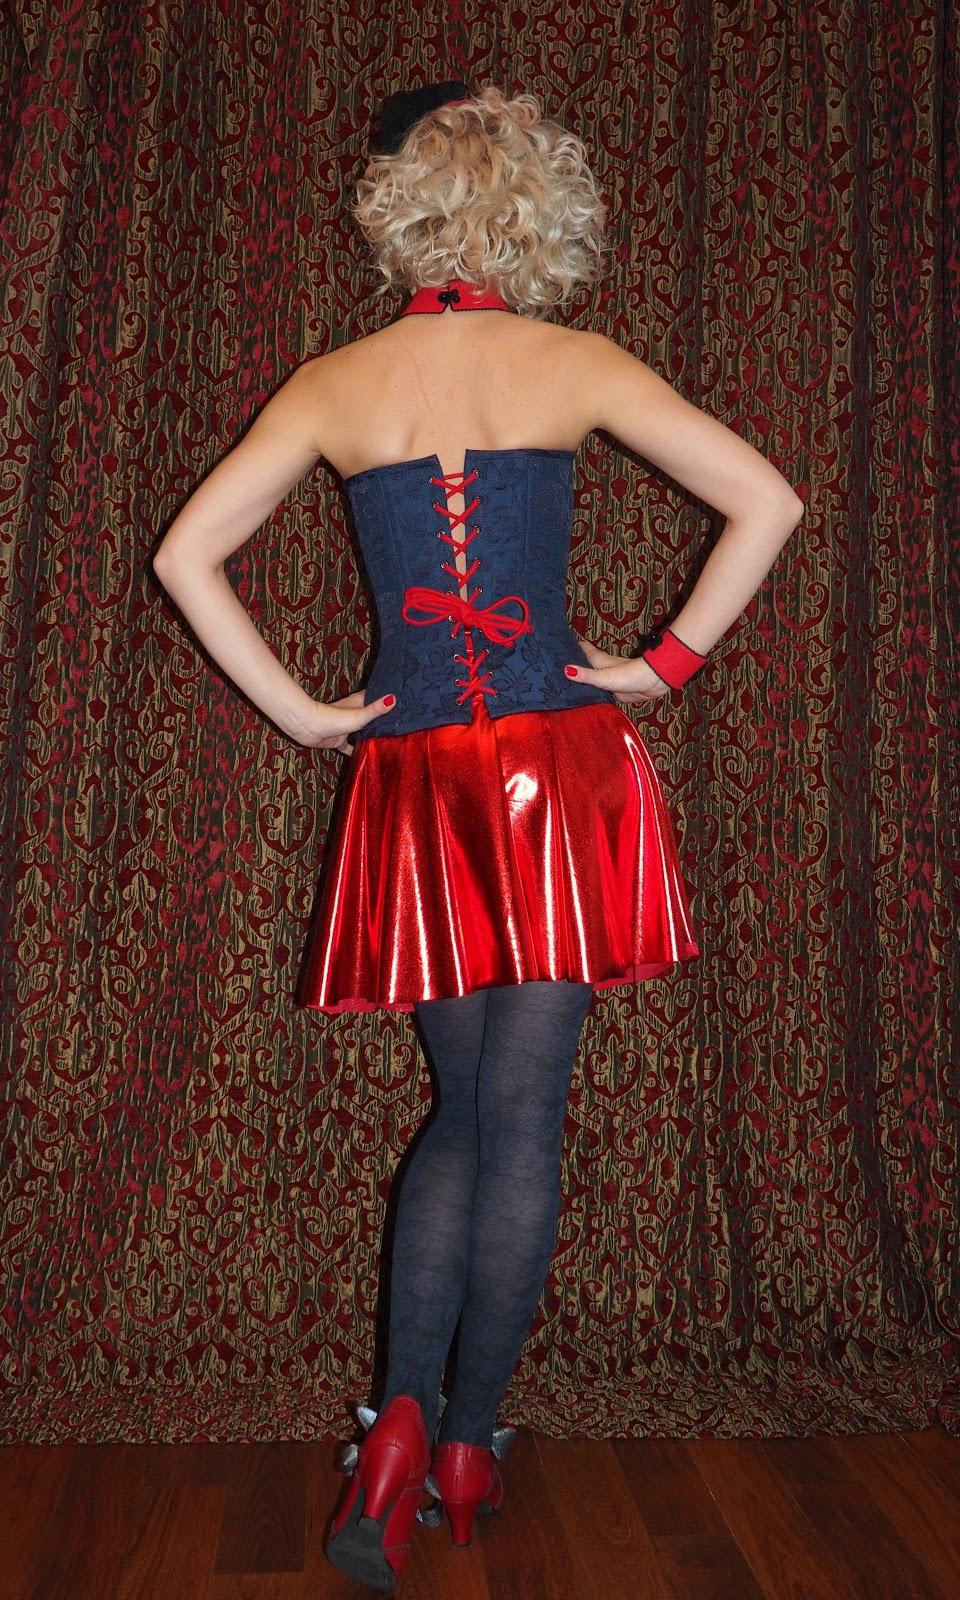 burlesque, buttons, choker, corset, fascinator, Gaultier, Glasgow, Glasgow Clyde College, goth, Madonna, shoes, skirt, soutache, tights, vegan, soutache, Vegetarian Shoes,